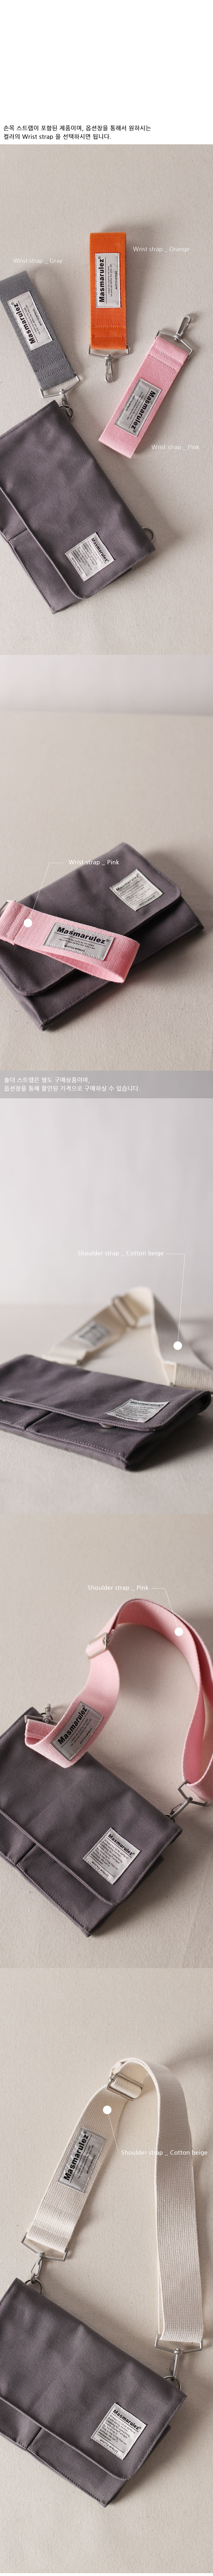 s-mini-pocket-gray-2.jpg